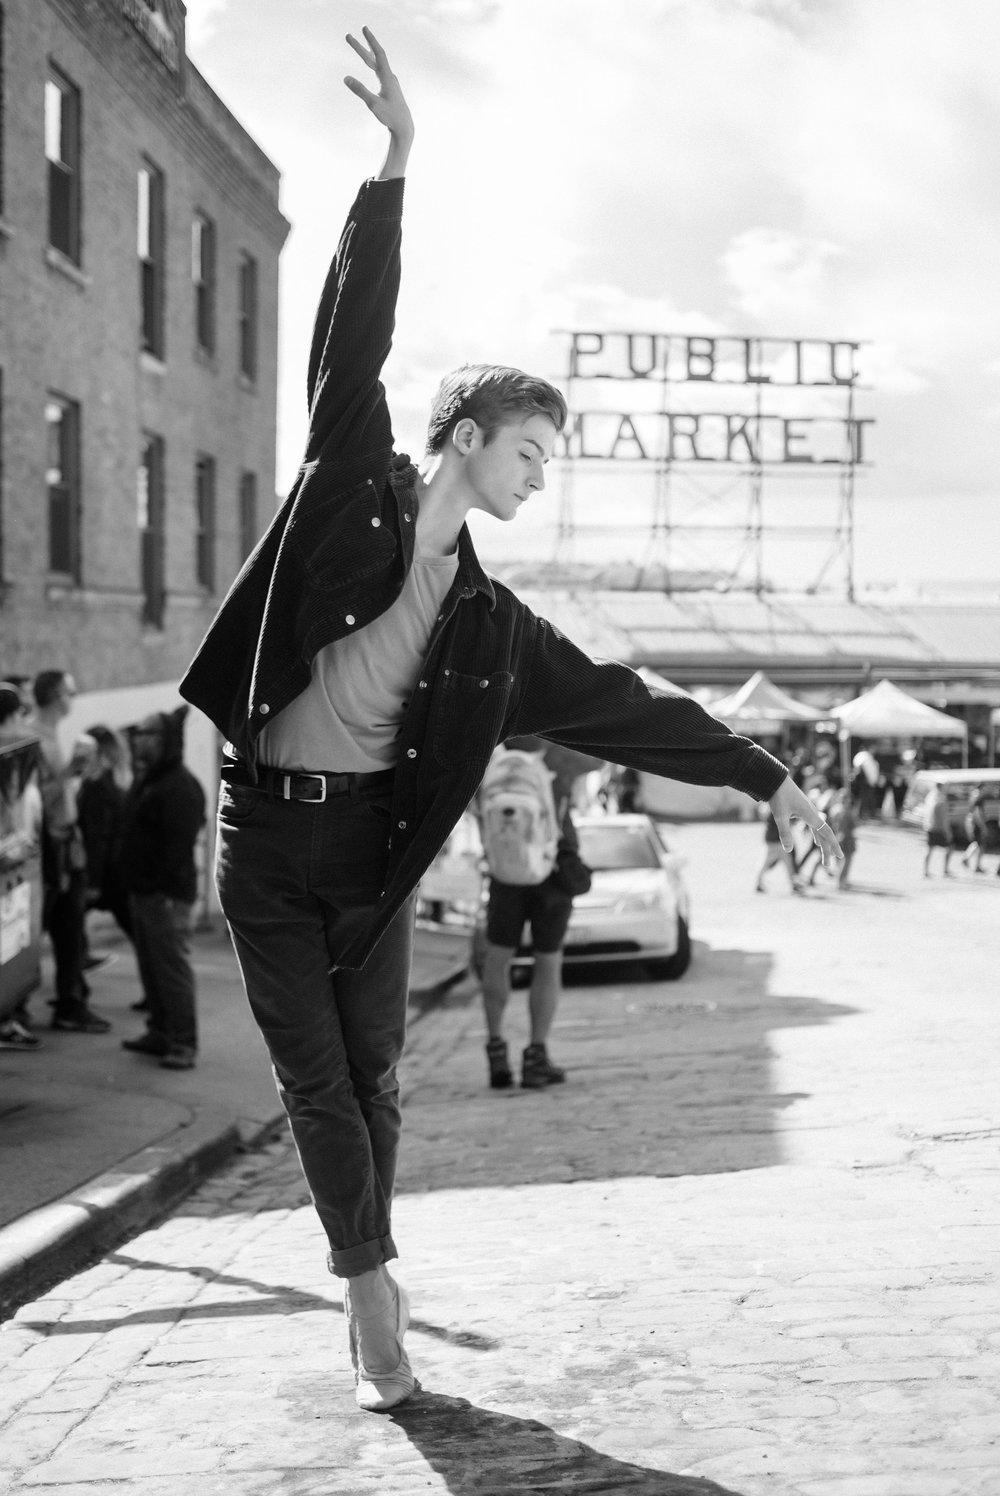 2017_09_18_keegan_seattle_downtown_dance_ballet_shoot-1325-Copy1.jpg